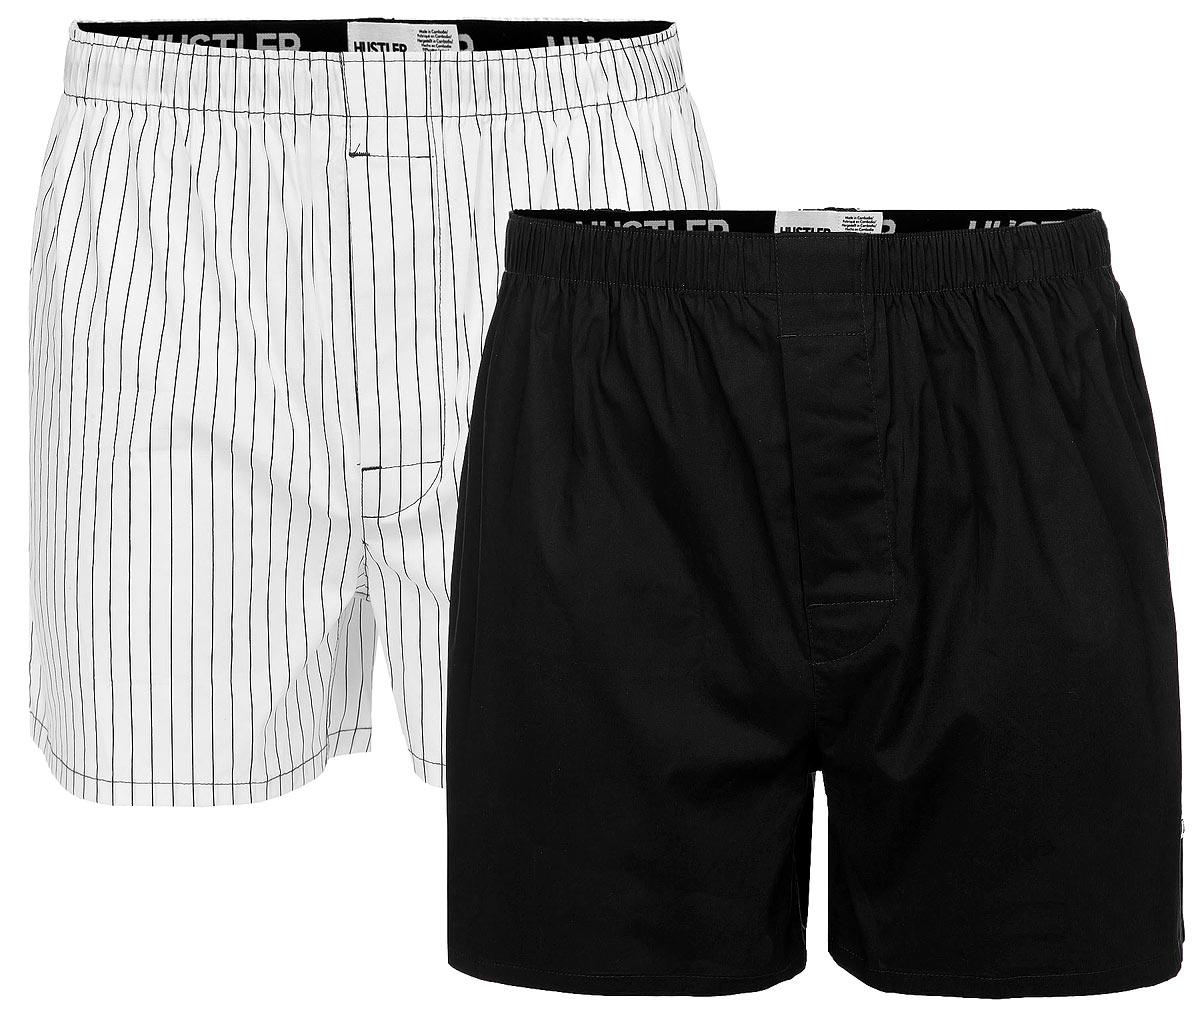 Трусы-шорты мужские Hustler Lingerie Blue Line, цвет: черный, белый, 2 шт. HUW-1011BLK. Размер S 46